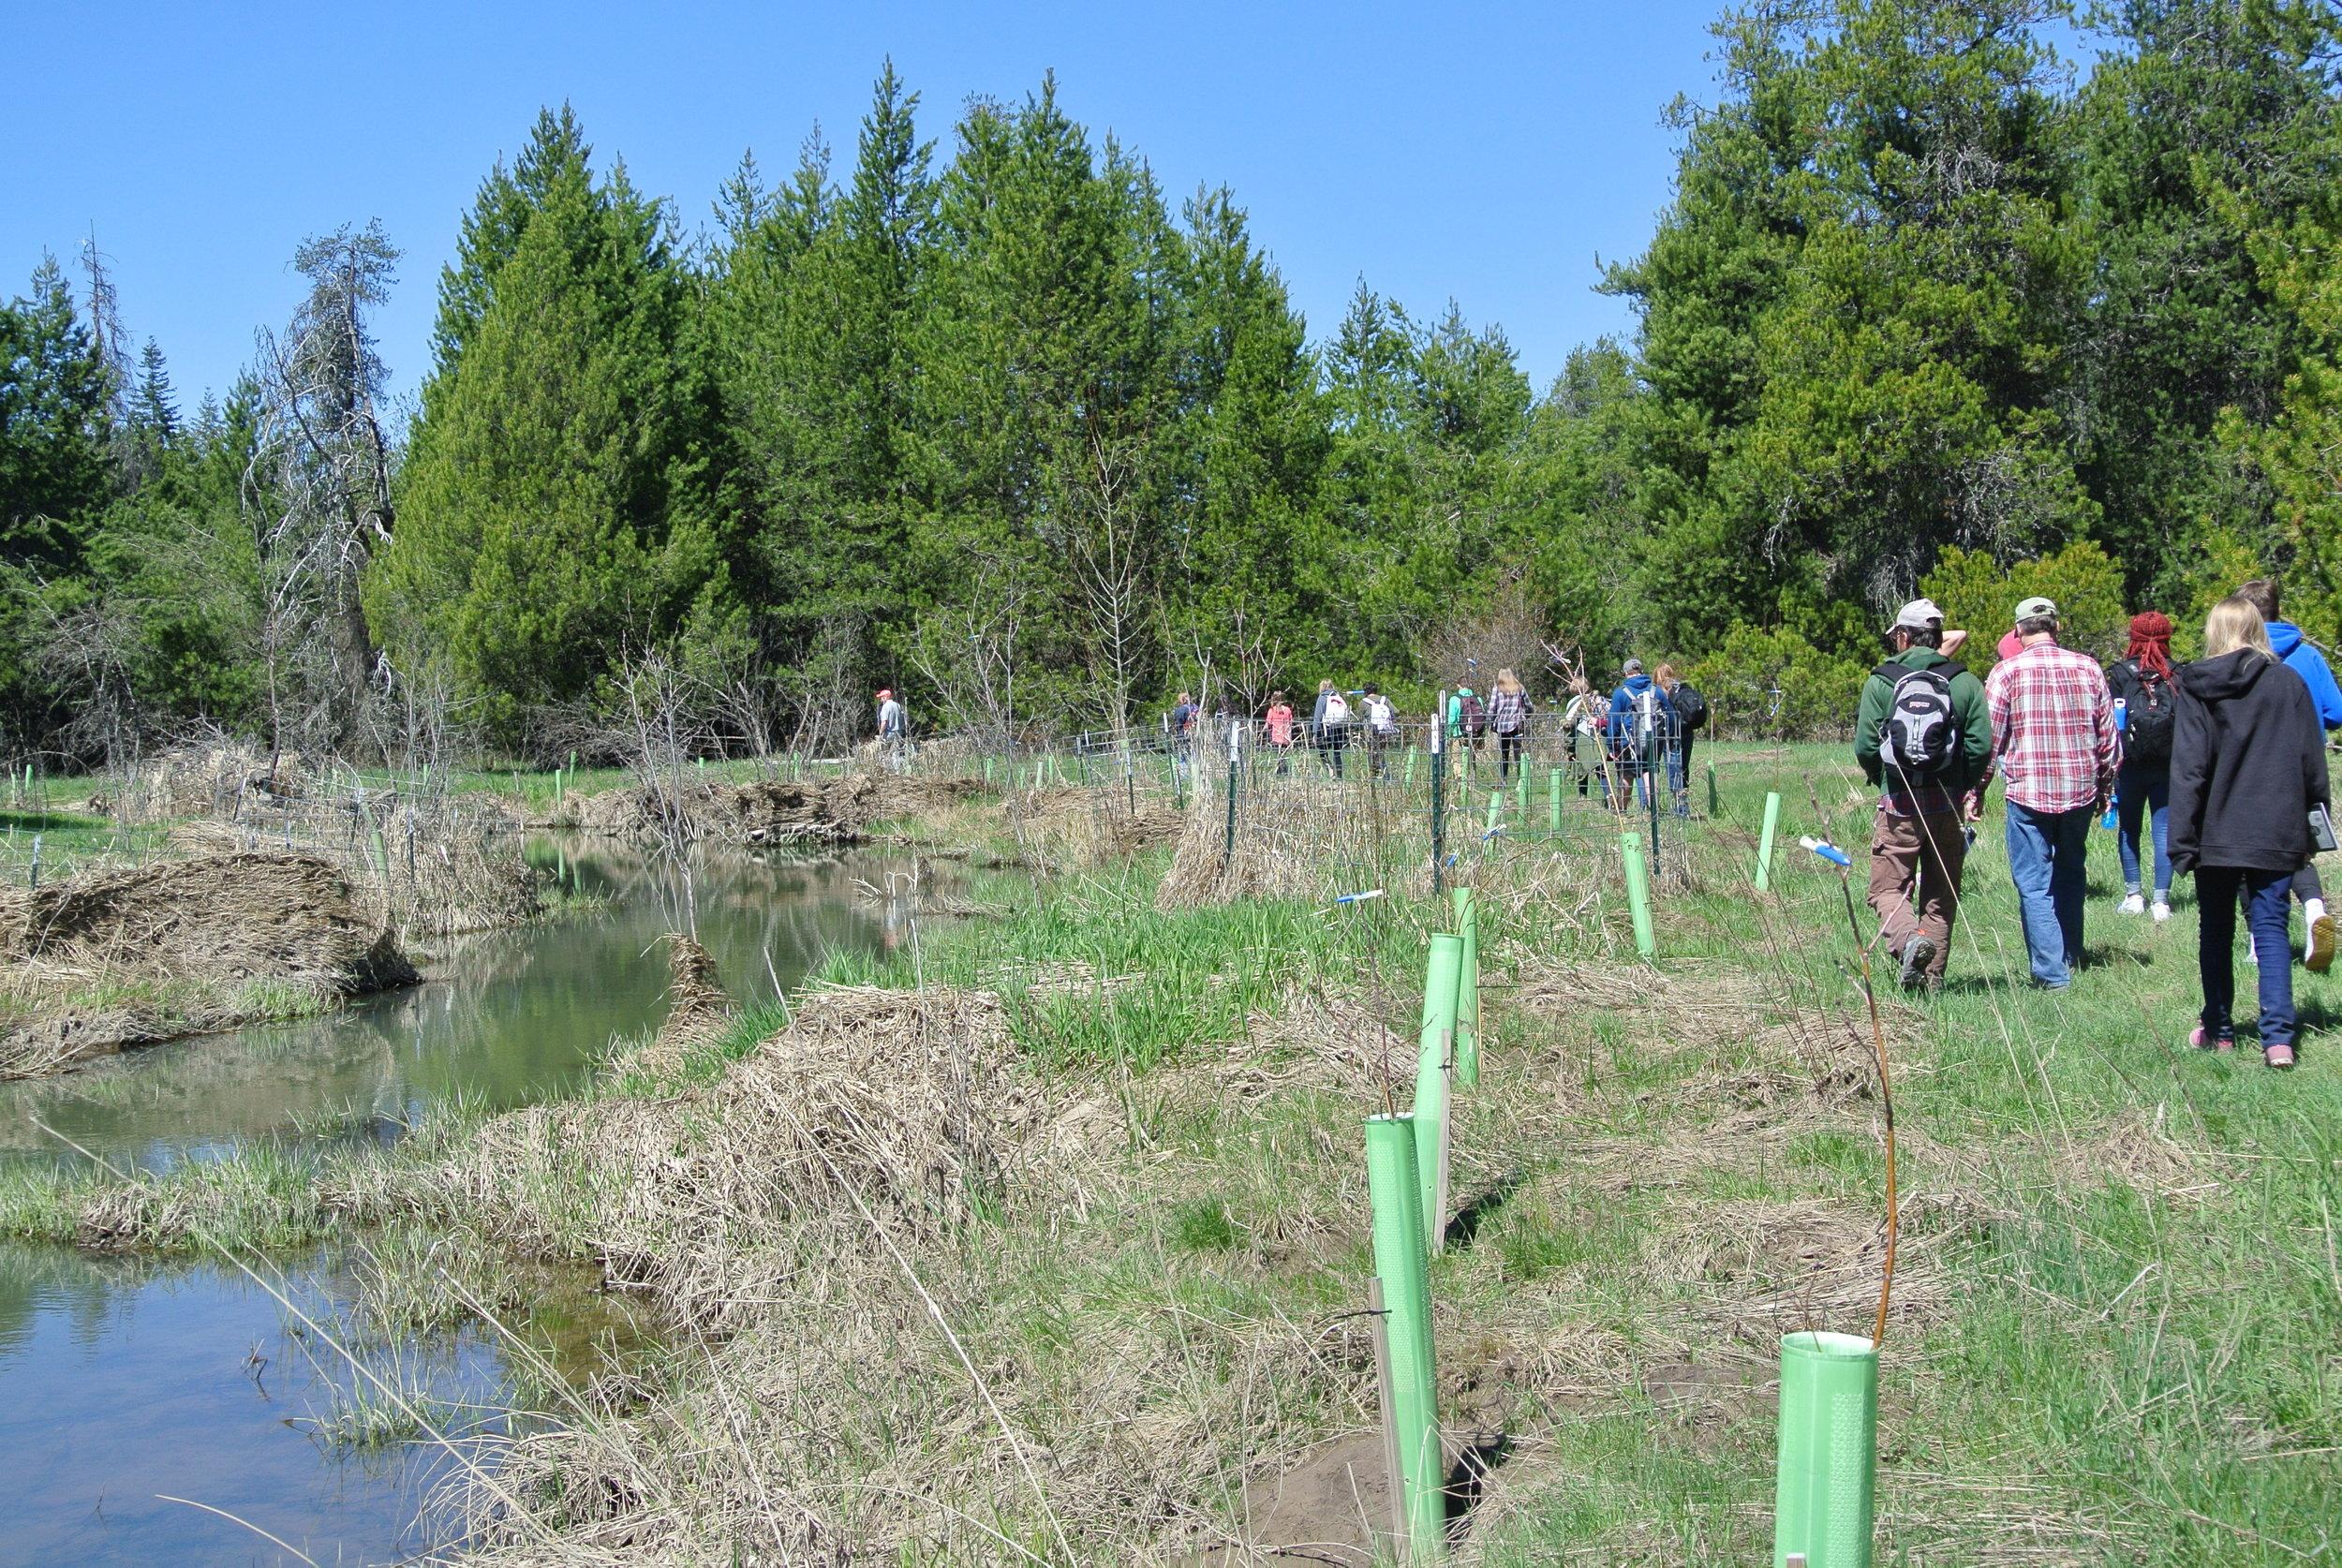 Students walk along the restored headwaters of Hangman Creek.